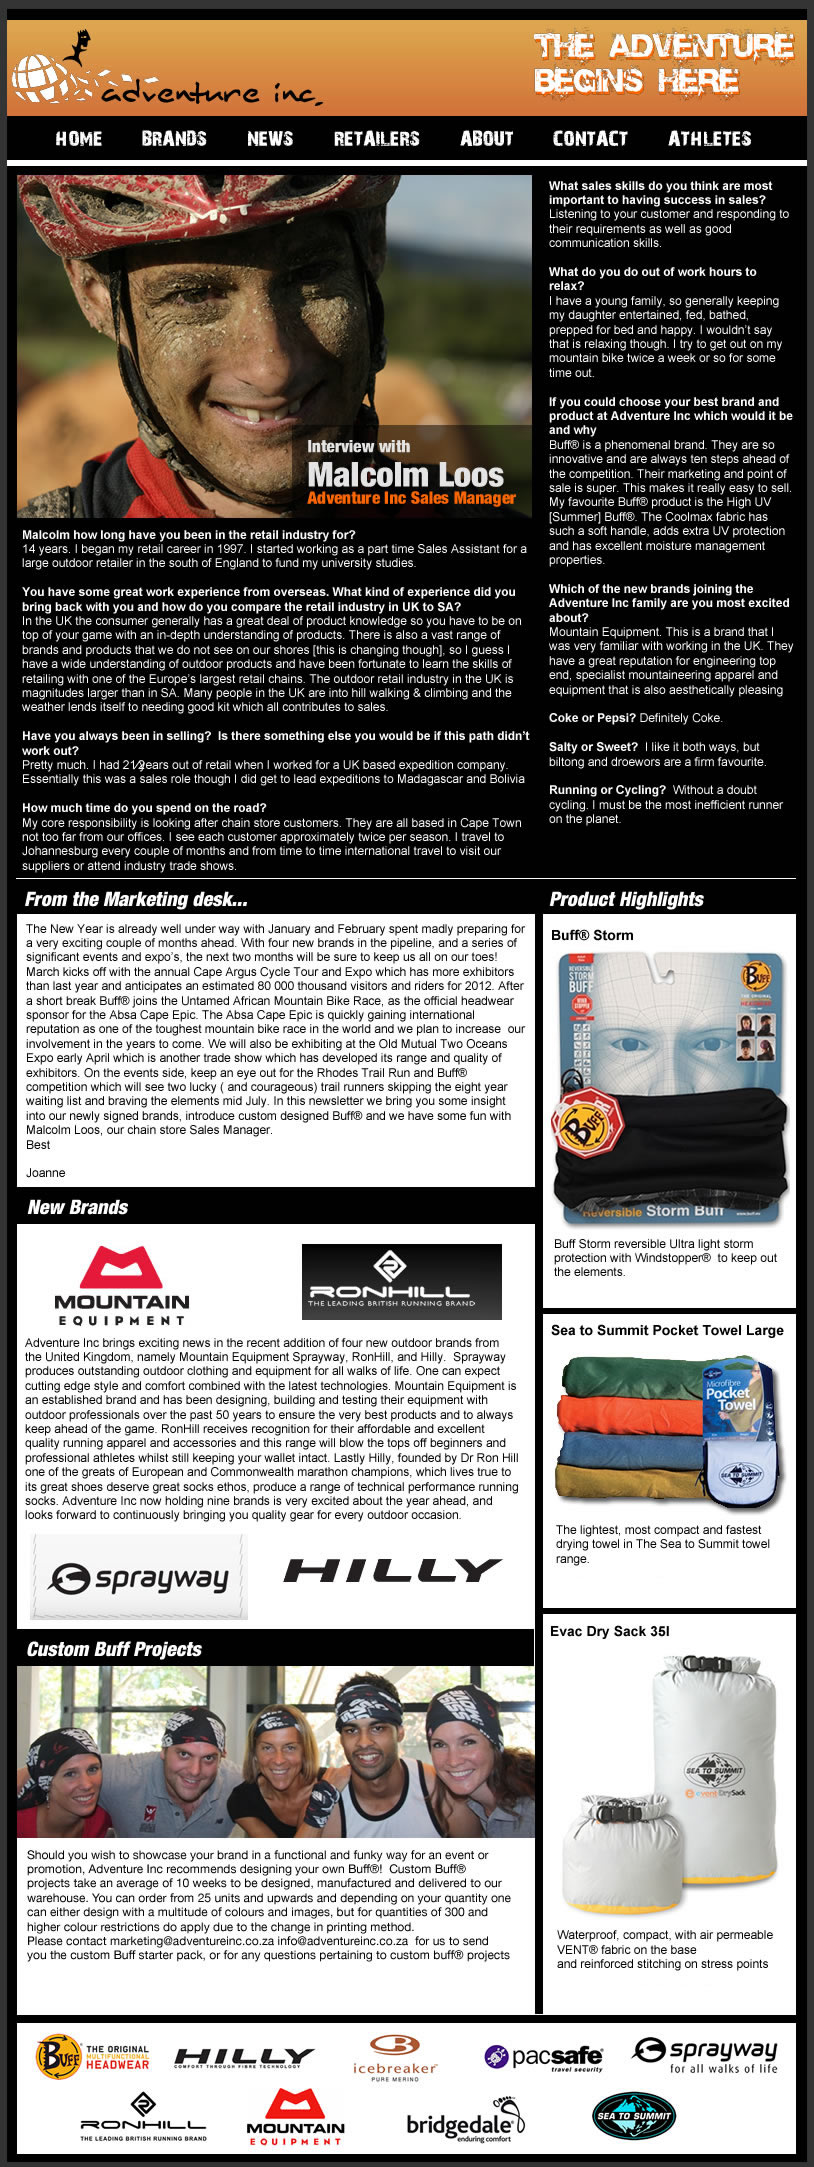 201202_newsletter_r2_c2_r1_c1